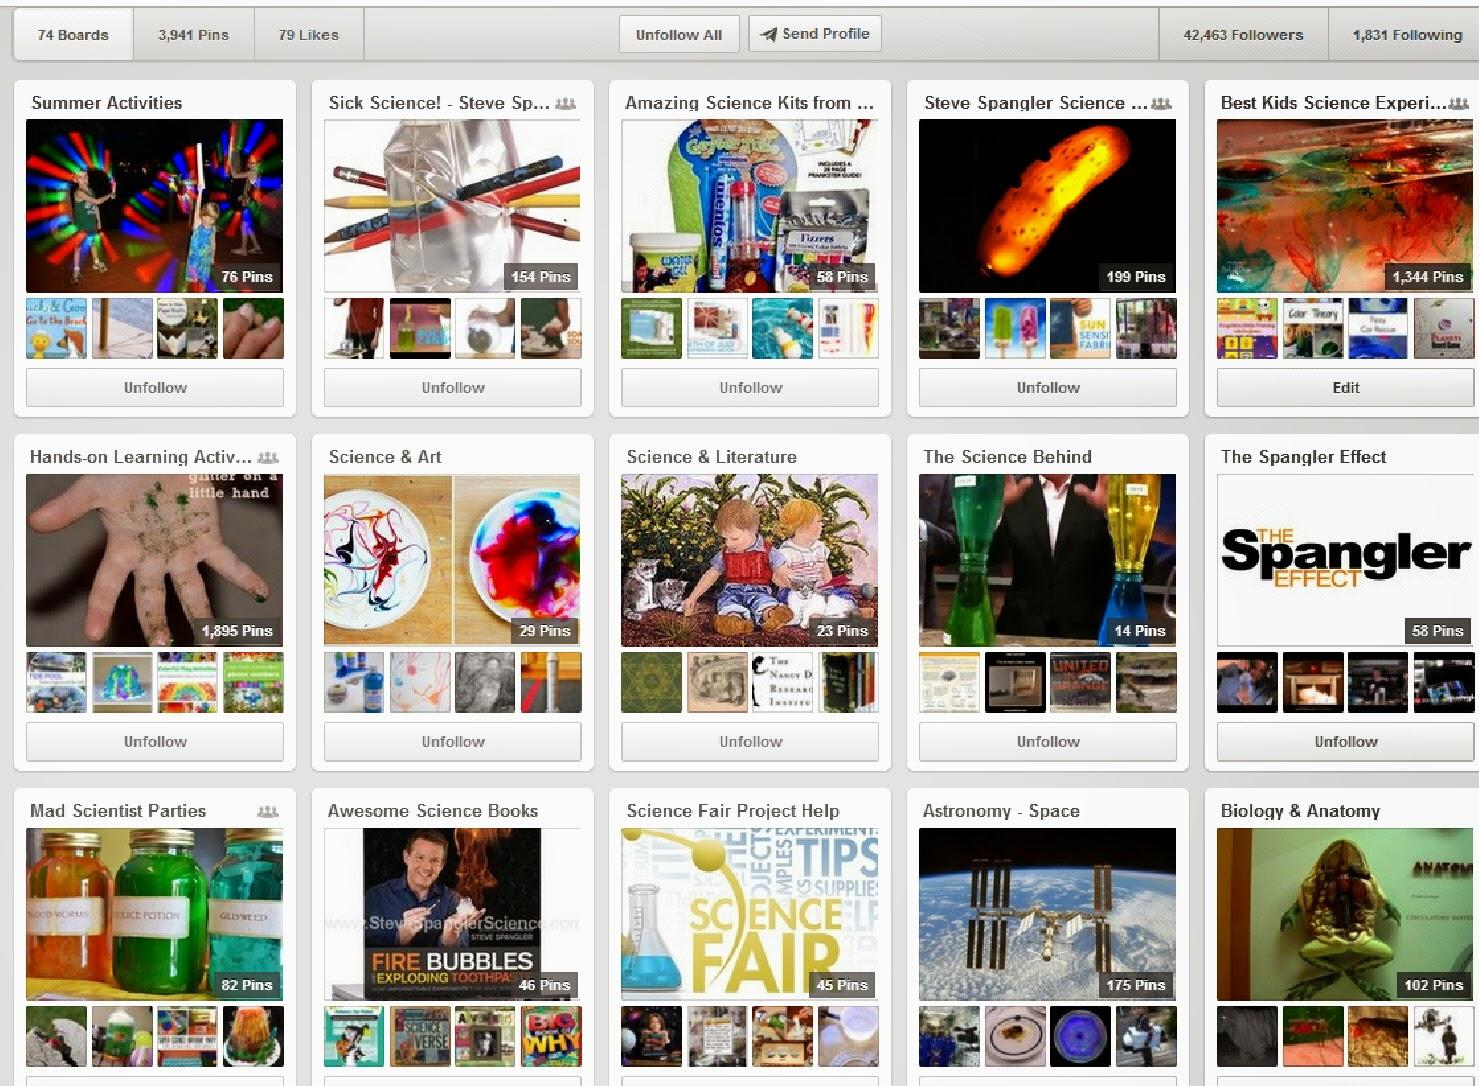 Best Science Pinterest Board for teachers, parents and homeschoolers